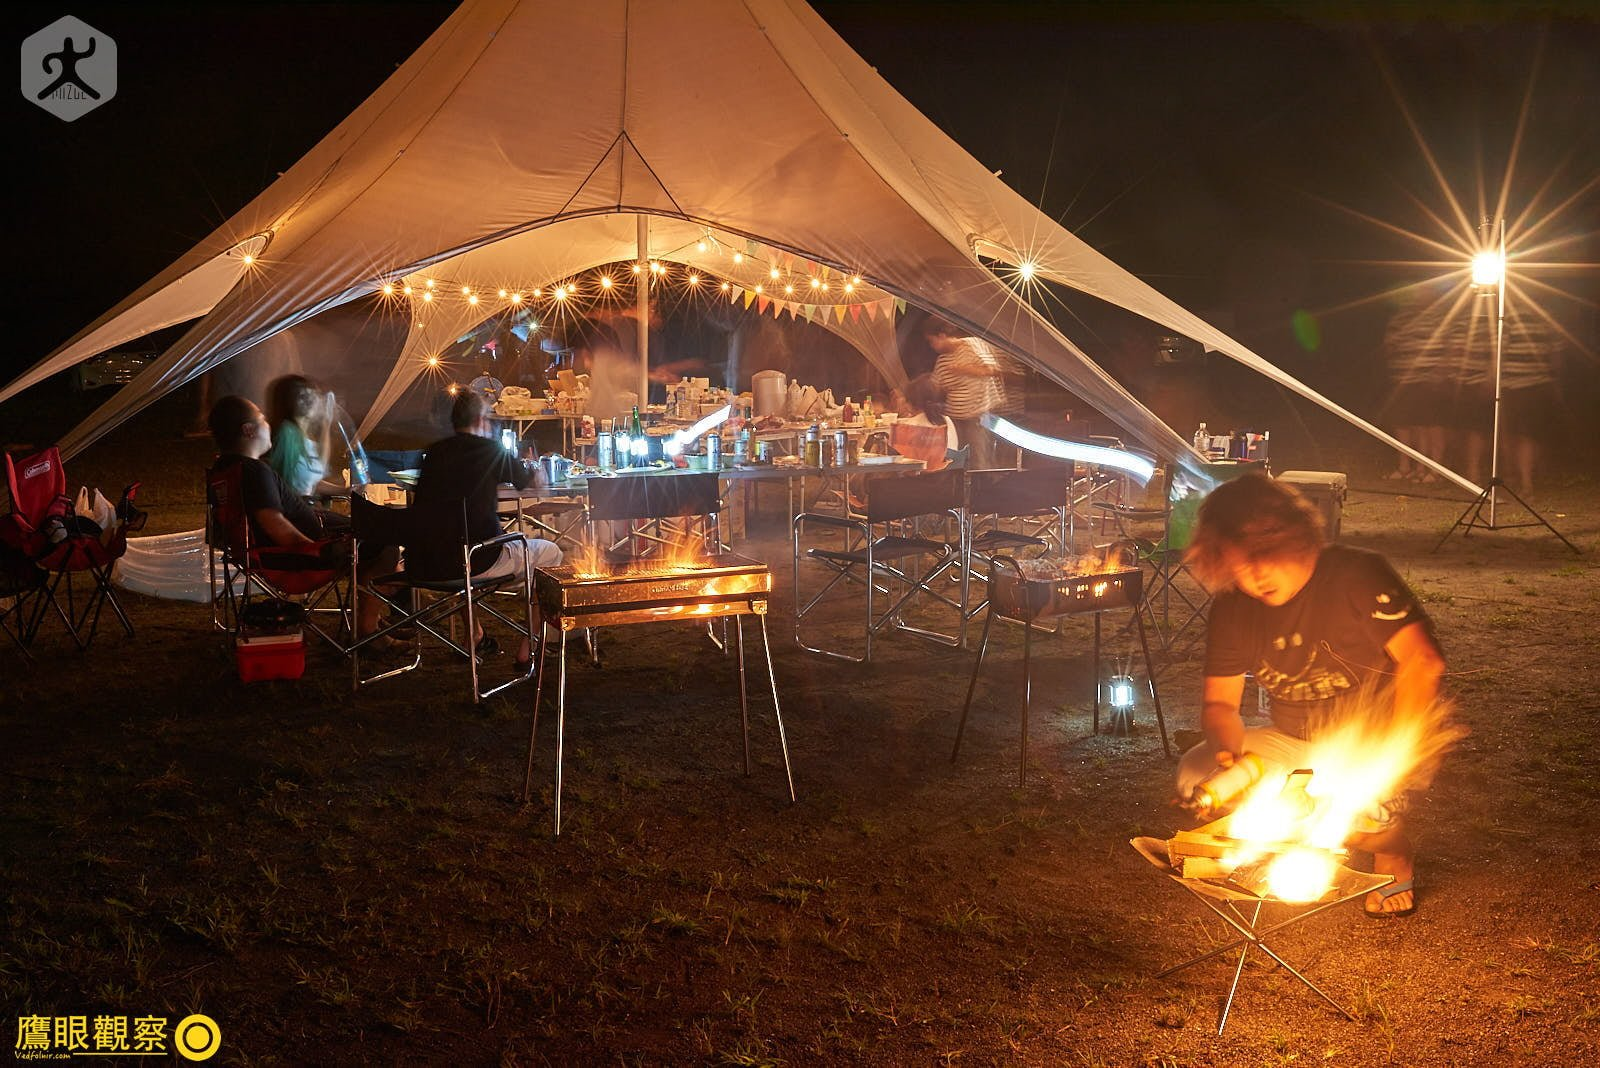 Japan Travel Barbecue party School 20190817192354 日本廢棄小學 🚗 RV 休旅車露營、森林探險之旅(櫪木縣鹿沼市立久我小學)🇯🇵⛺️